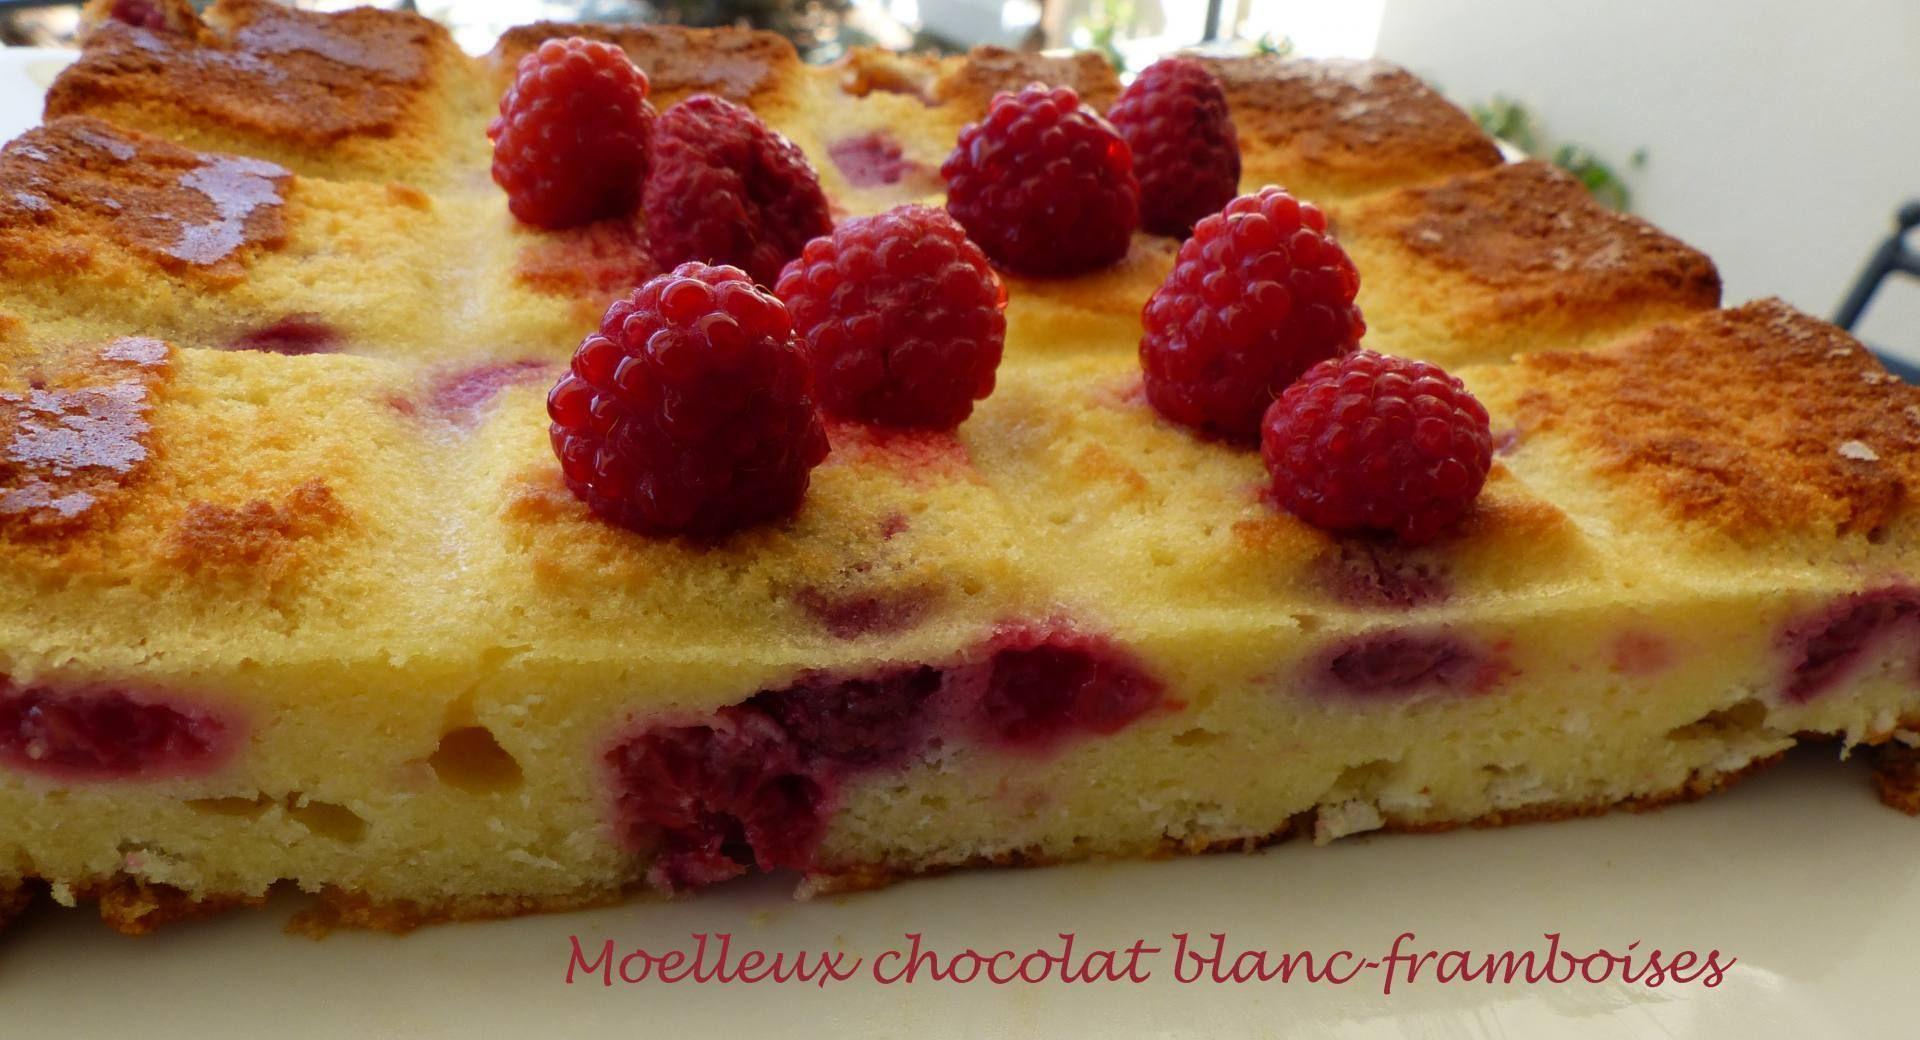 Moelleux chocolat blanc-framboises P1180463 R   Moelleux ...